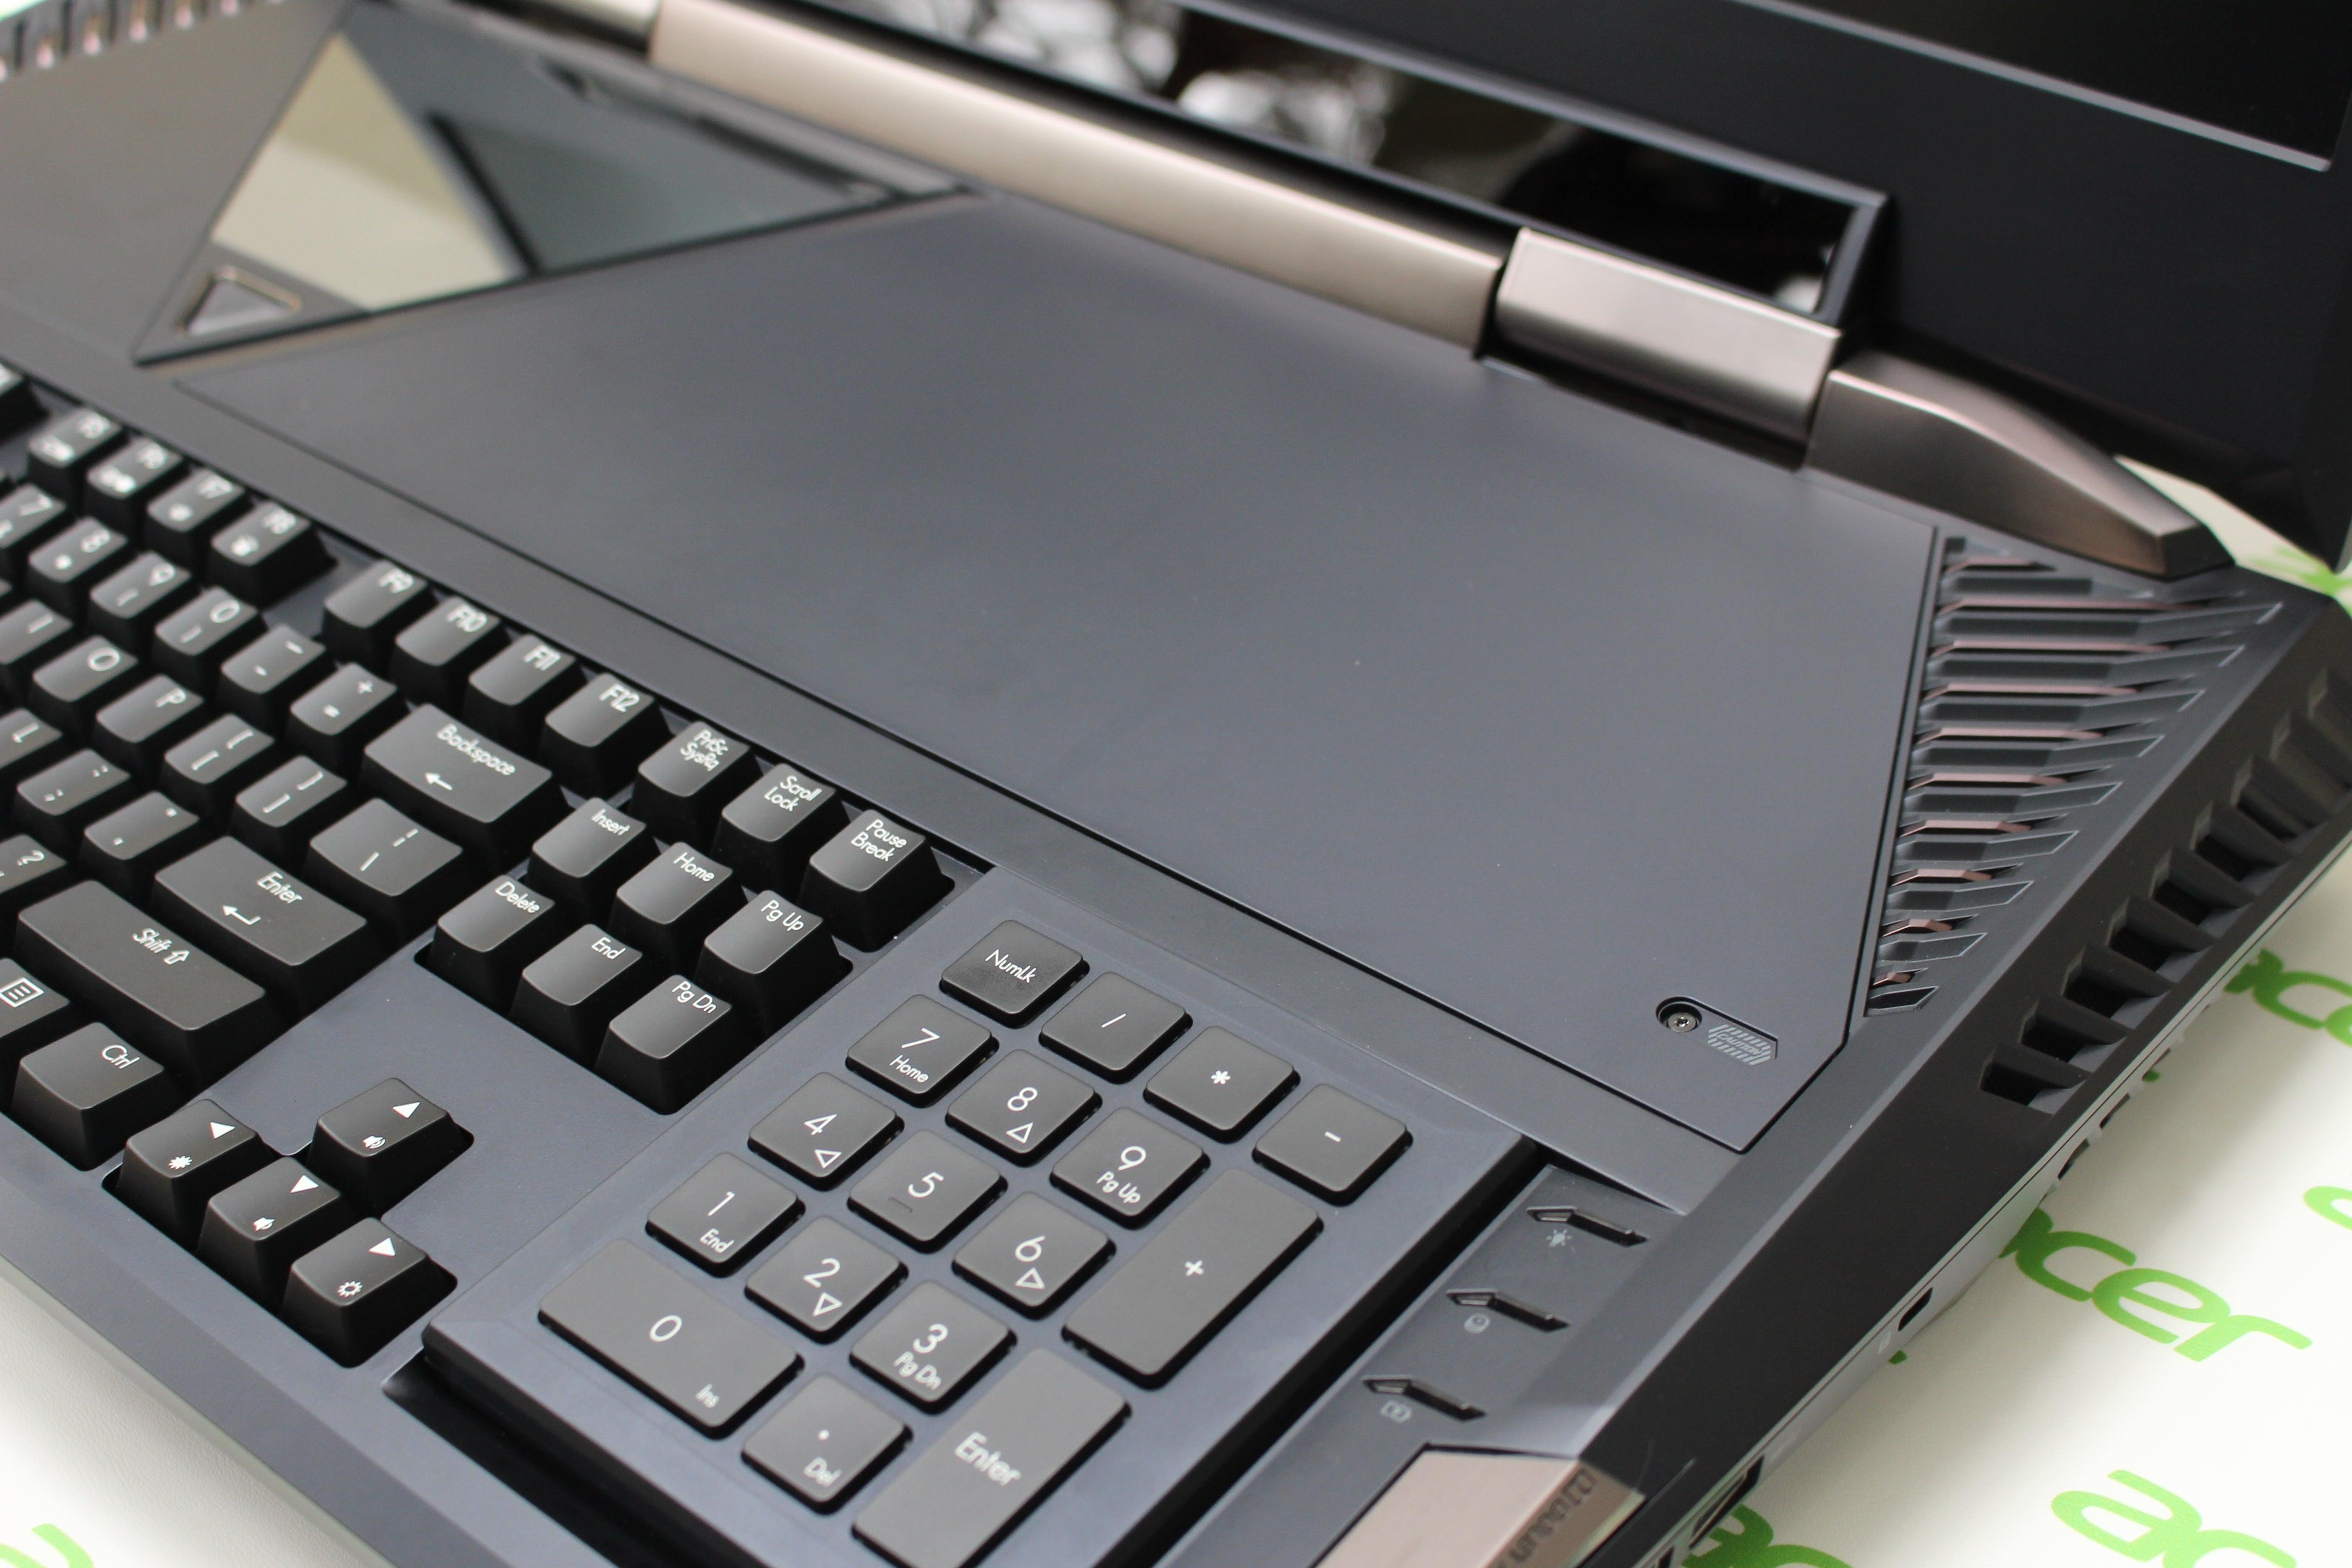 Hands On Acers Predator 21 X Packs Desktop Grade Gaming Into A Diagram Of Internal Computer Parts Laptop Acer Top Panel Keyboard